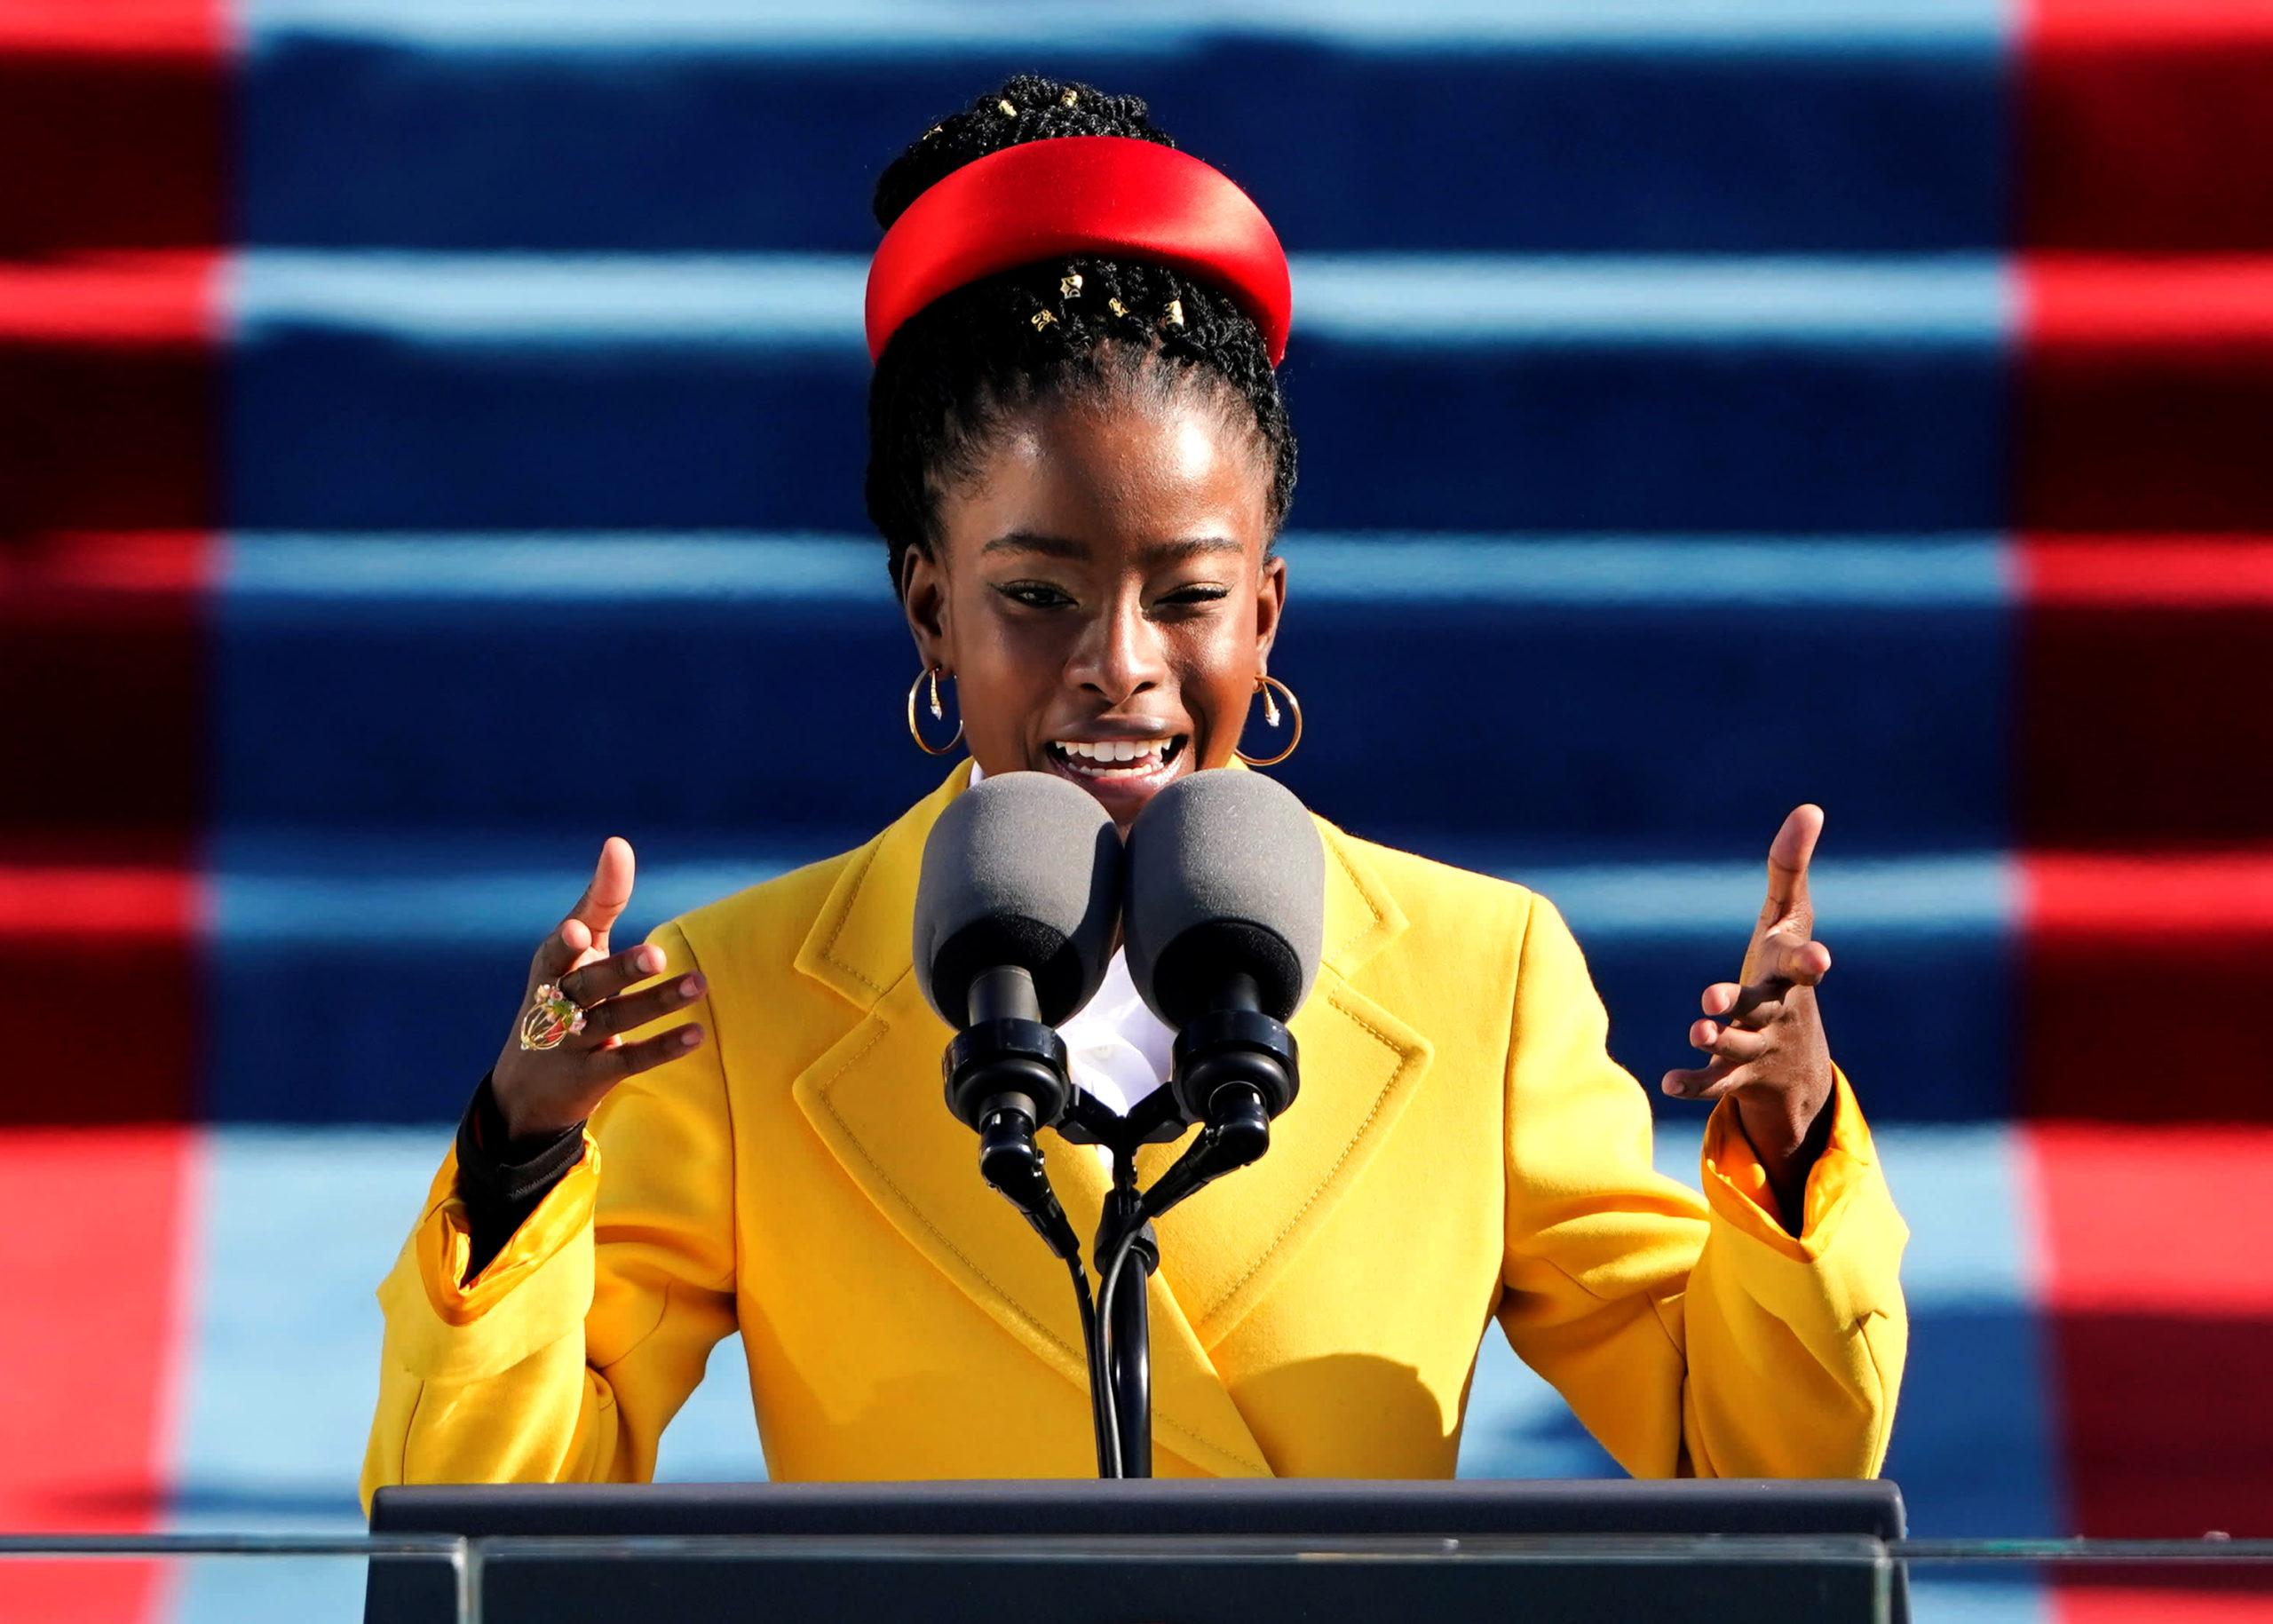 WATCH: Amanda Gorman's Inauguration Poem & Transcript